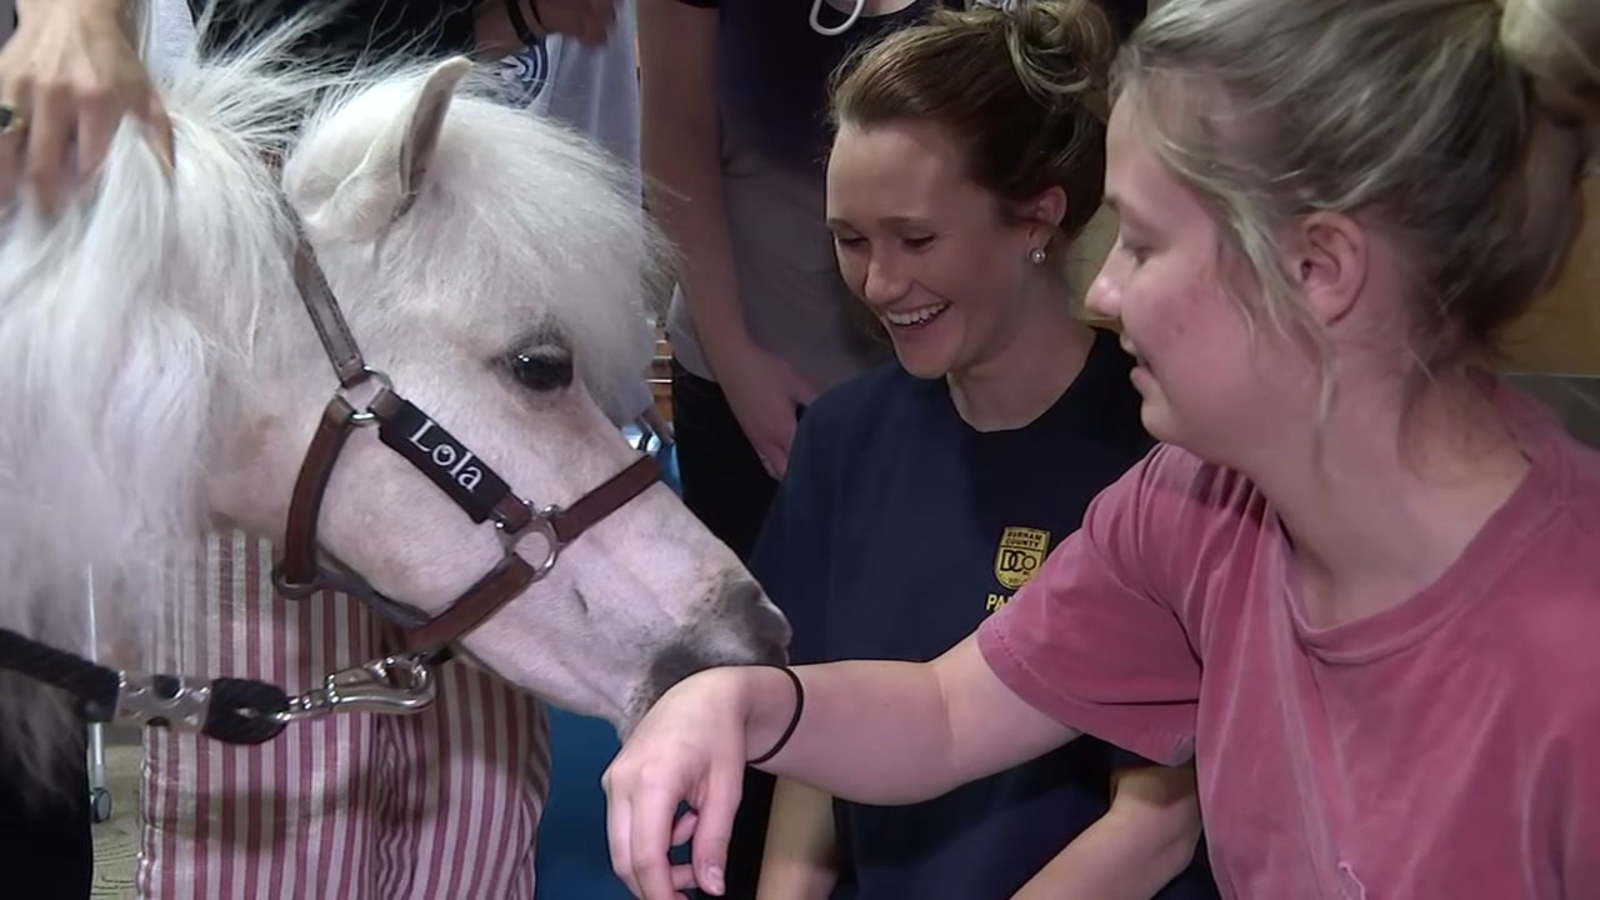 WATCH: Miniature horses visit UNC during exam week